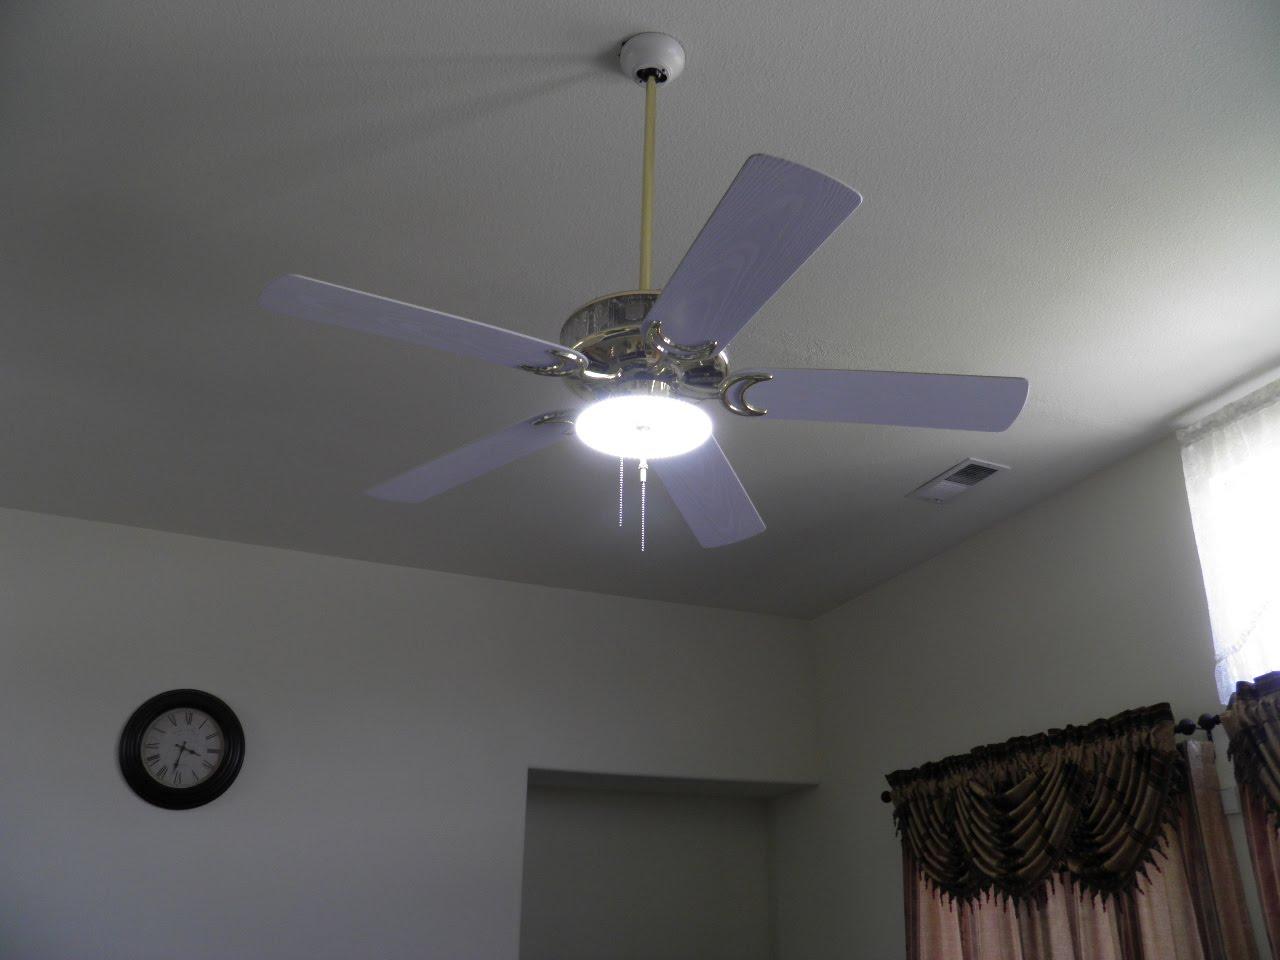 Led Ceiling Fan Lights Energy Efficient Brightening